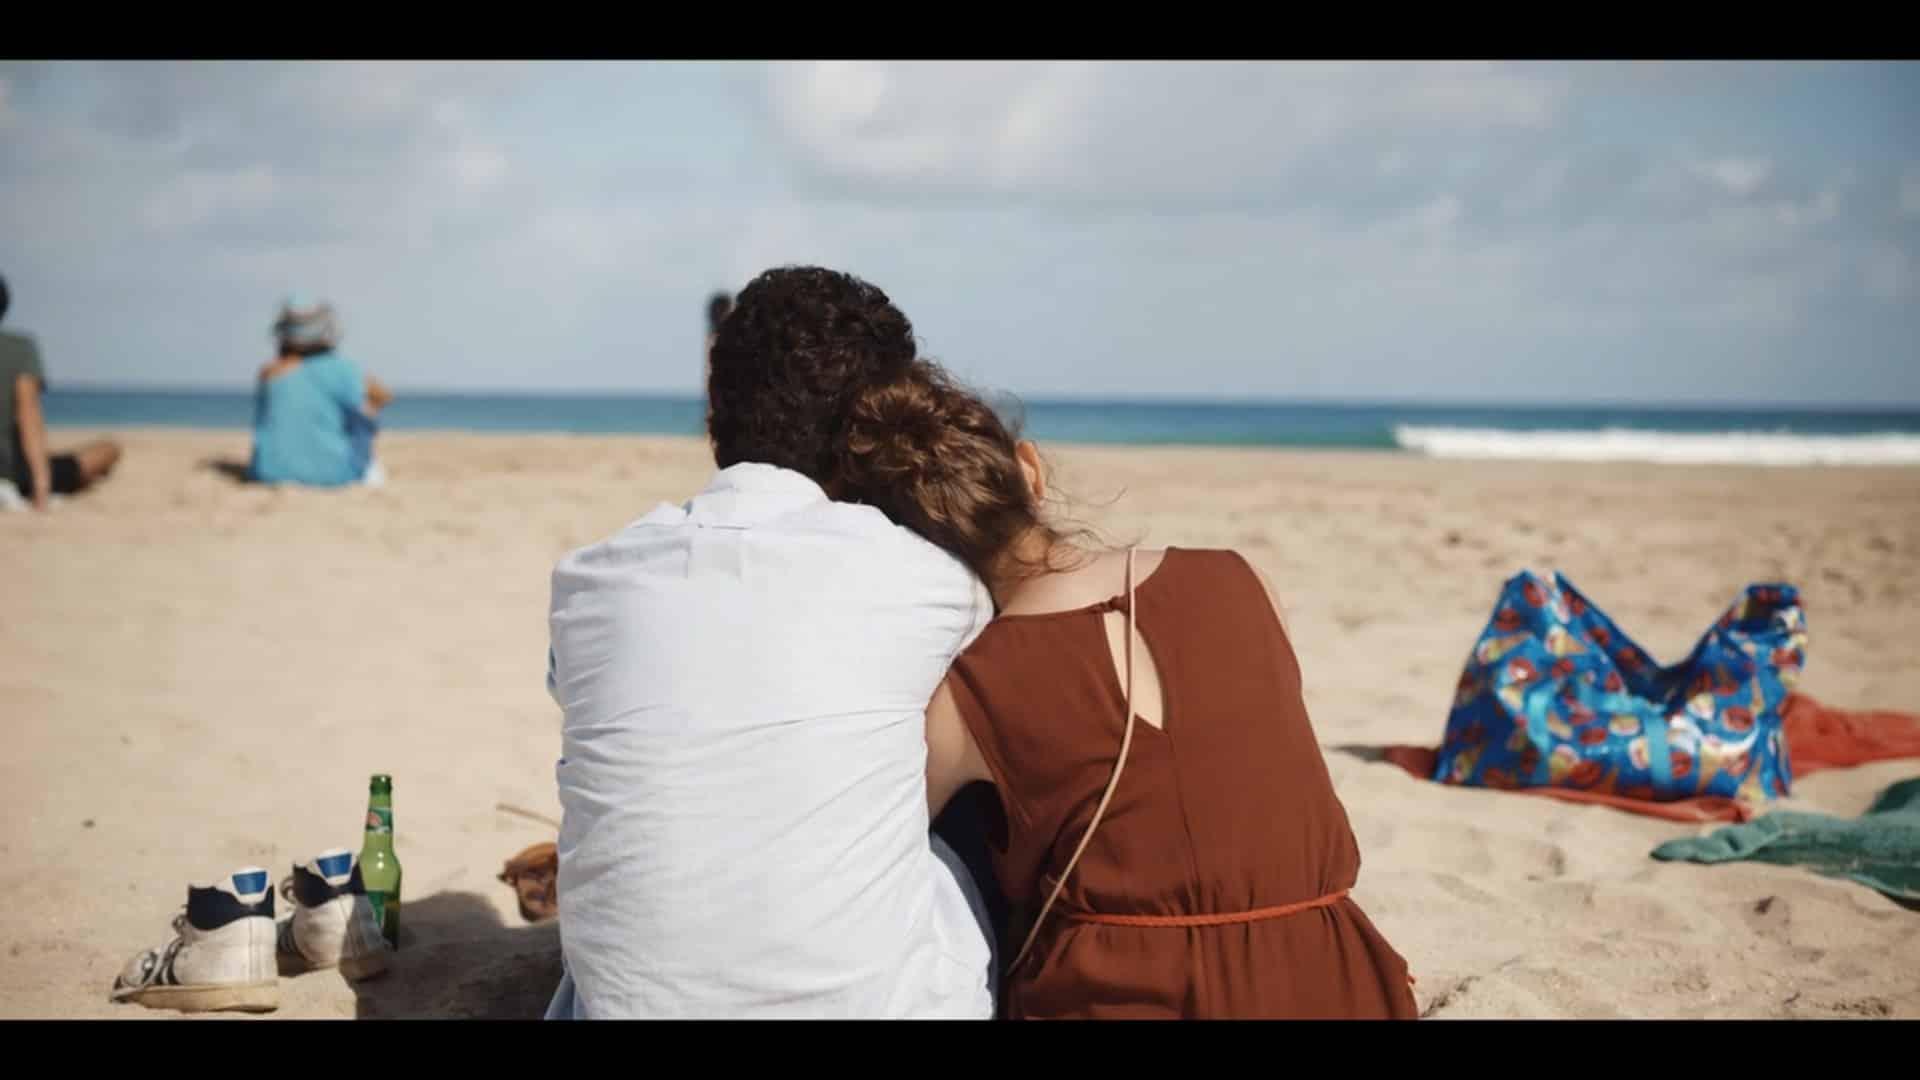 Sara (Elvira Camarrone) and Lorenzo (Roberto Christian) on a date